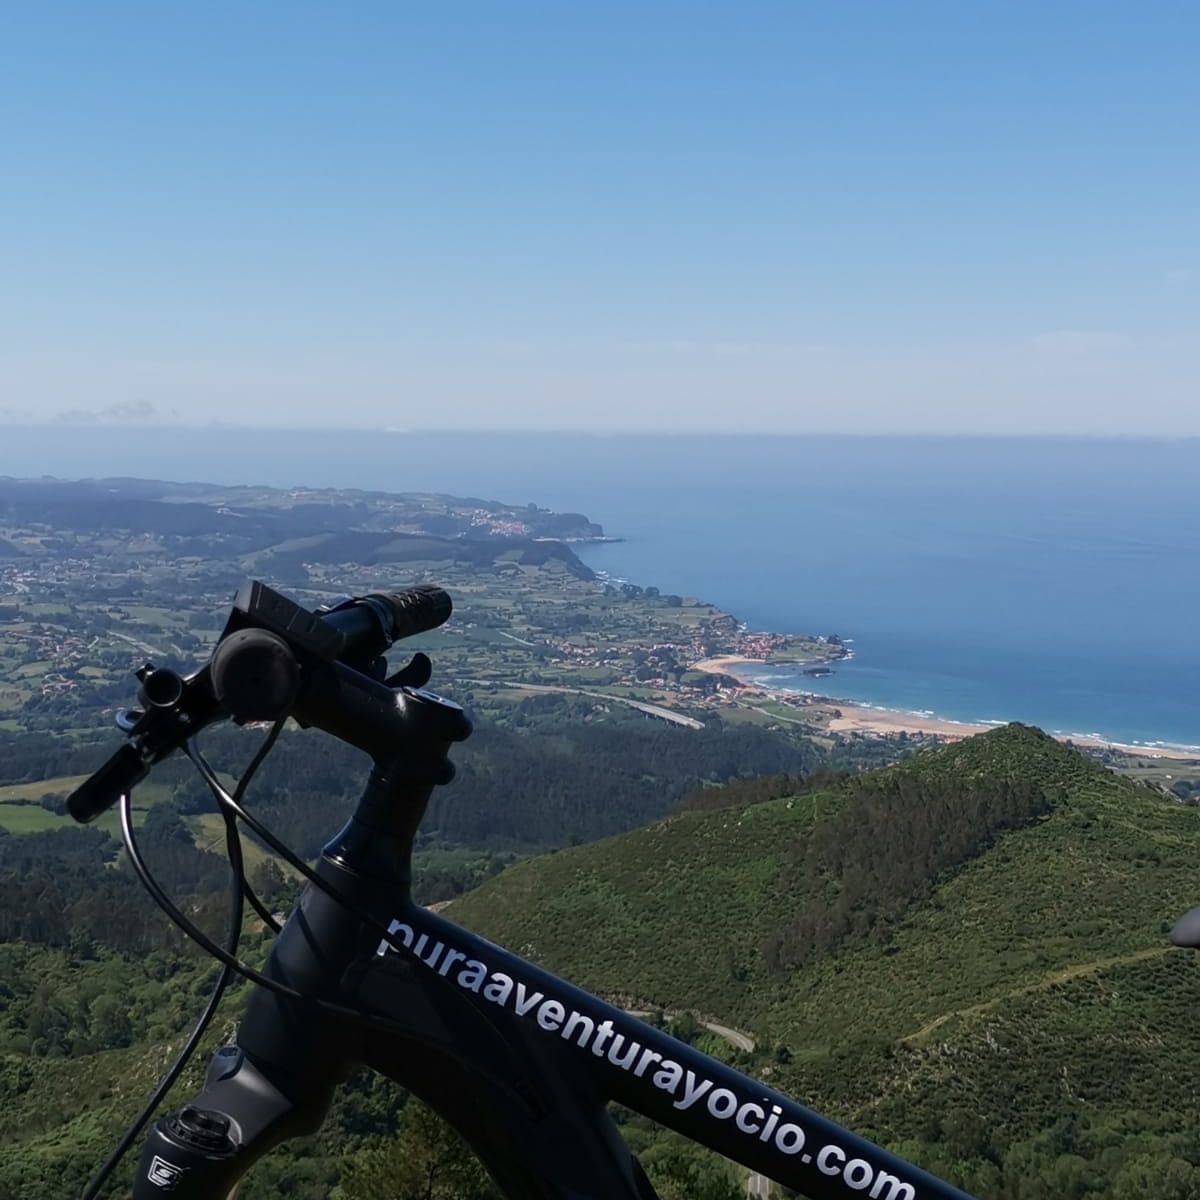 ¿Mar?¿montaña?...pues ambas en la sierra del Sueve https://t.co/kVwnTagVBi #puraaventurayocio #bike #bikeinstagram #piloña #btt #turismoasturias #turismonacional  #ebike #bicielectrica #alquilerdebicicletaselectricas #vistapiloña #tierradeasturcones https://t.co/SFBjPbSRQ6